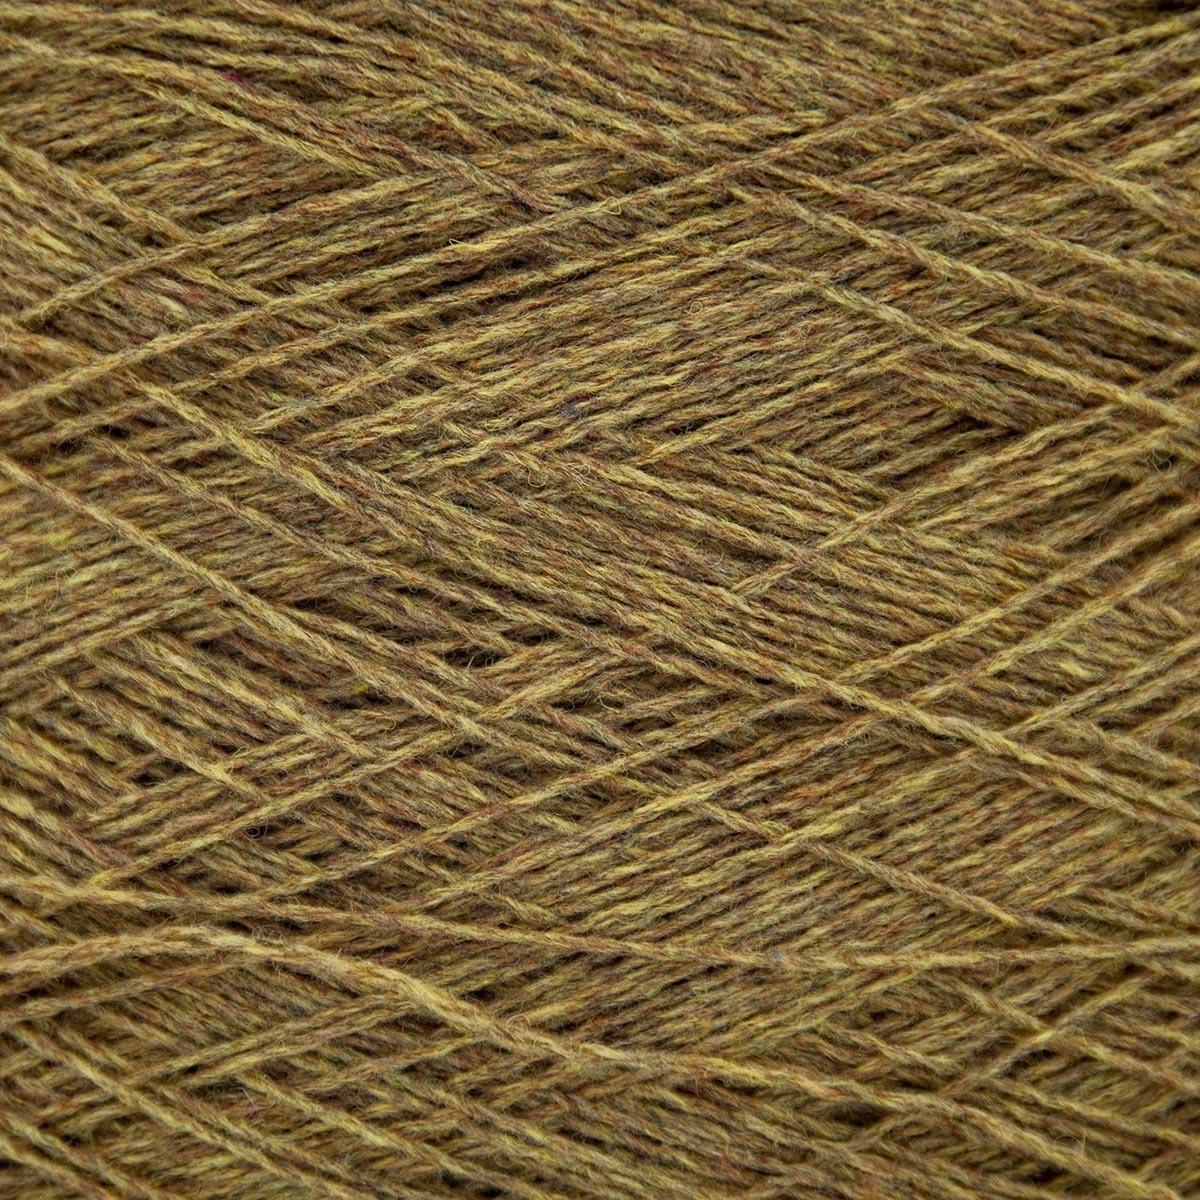 Knoll Yarns Merino Lambswool - 339